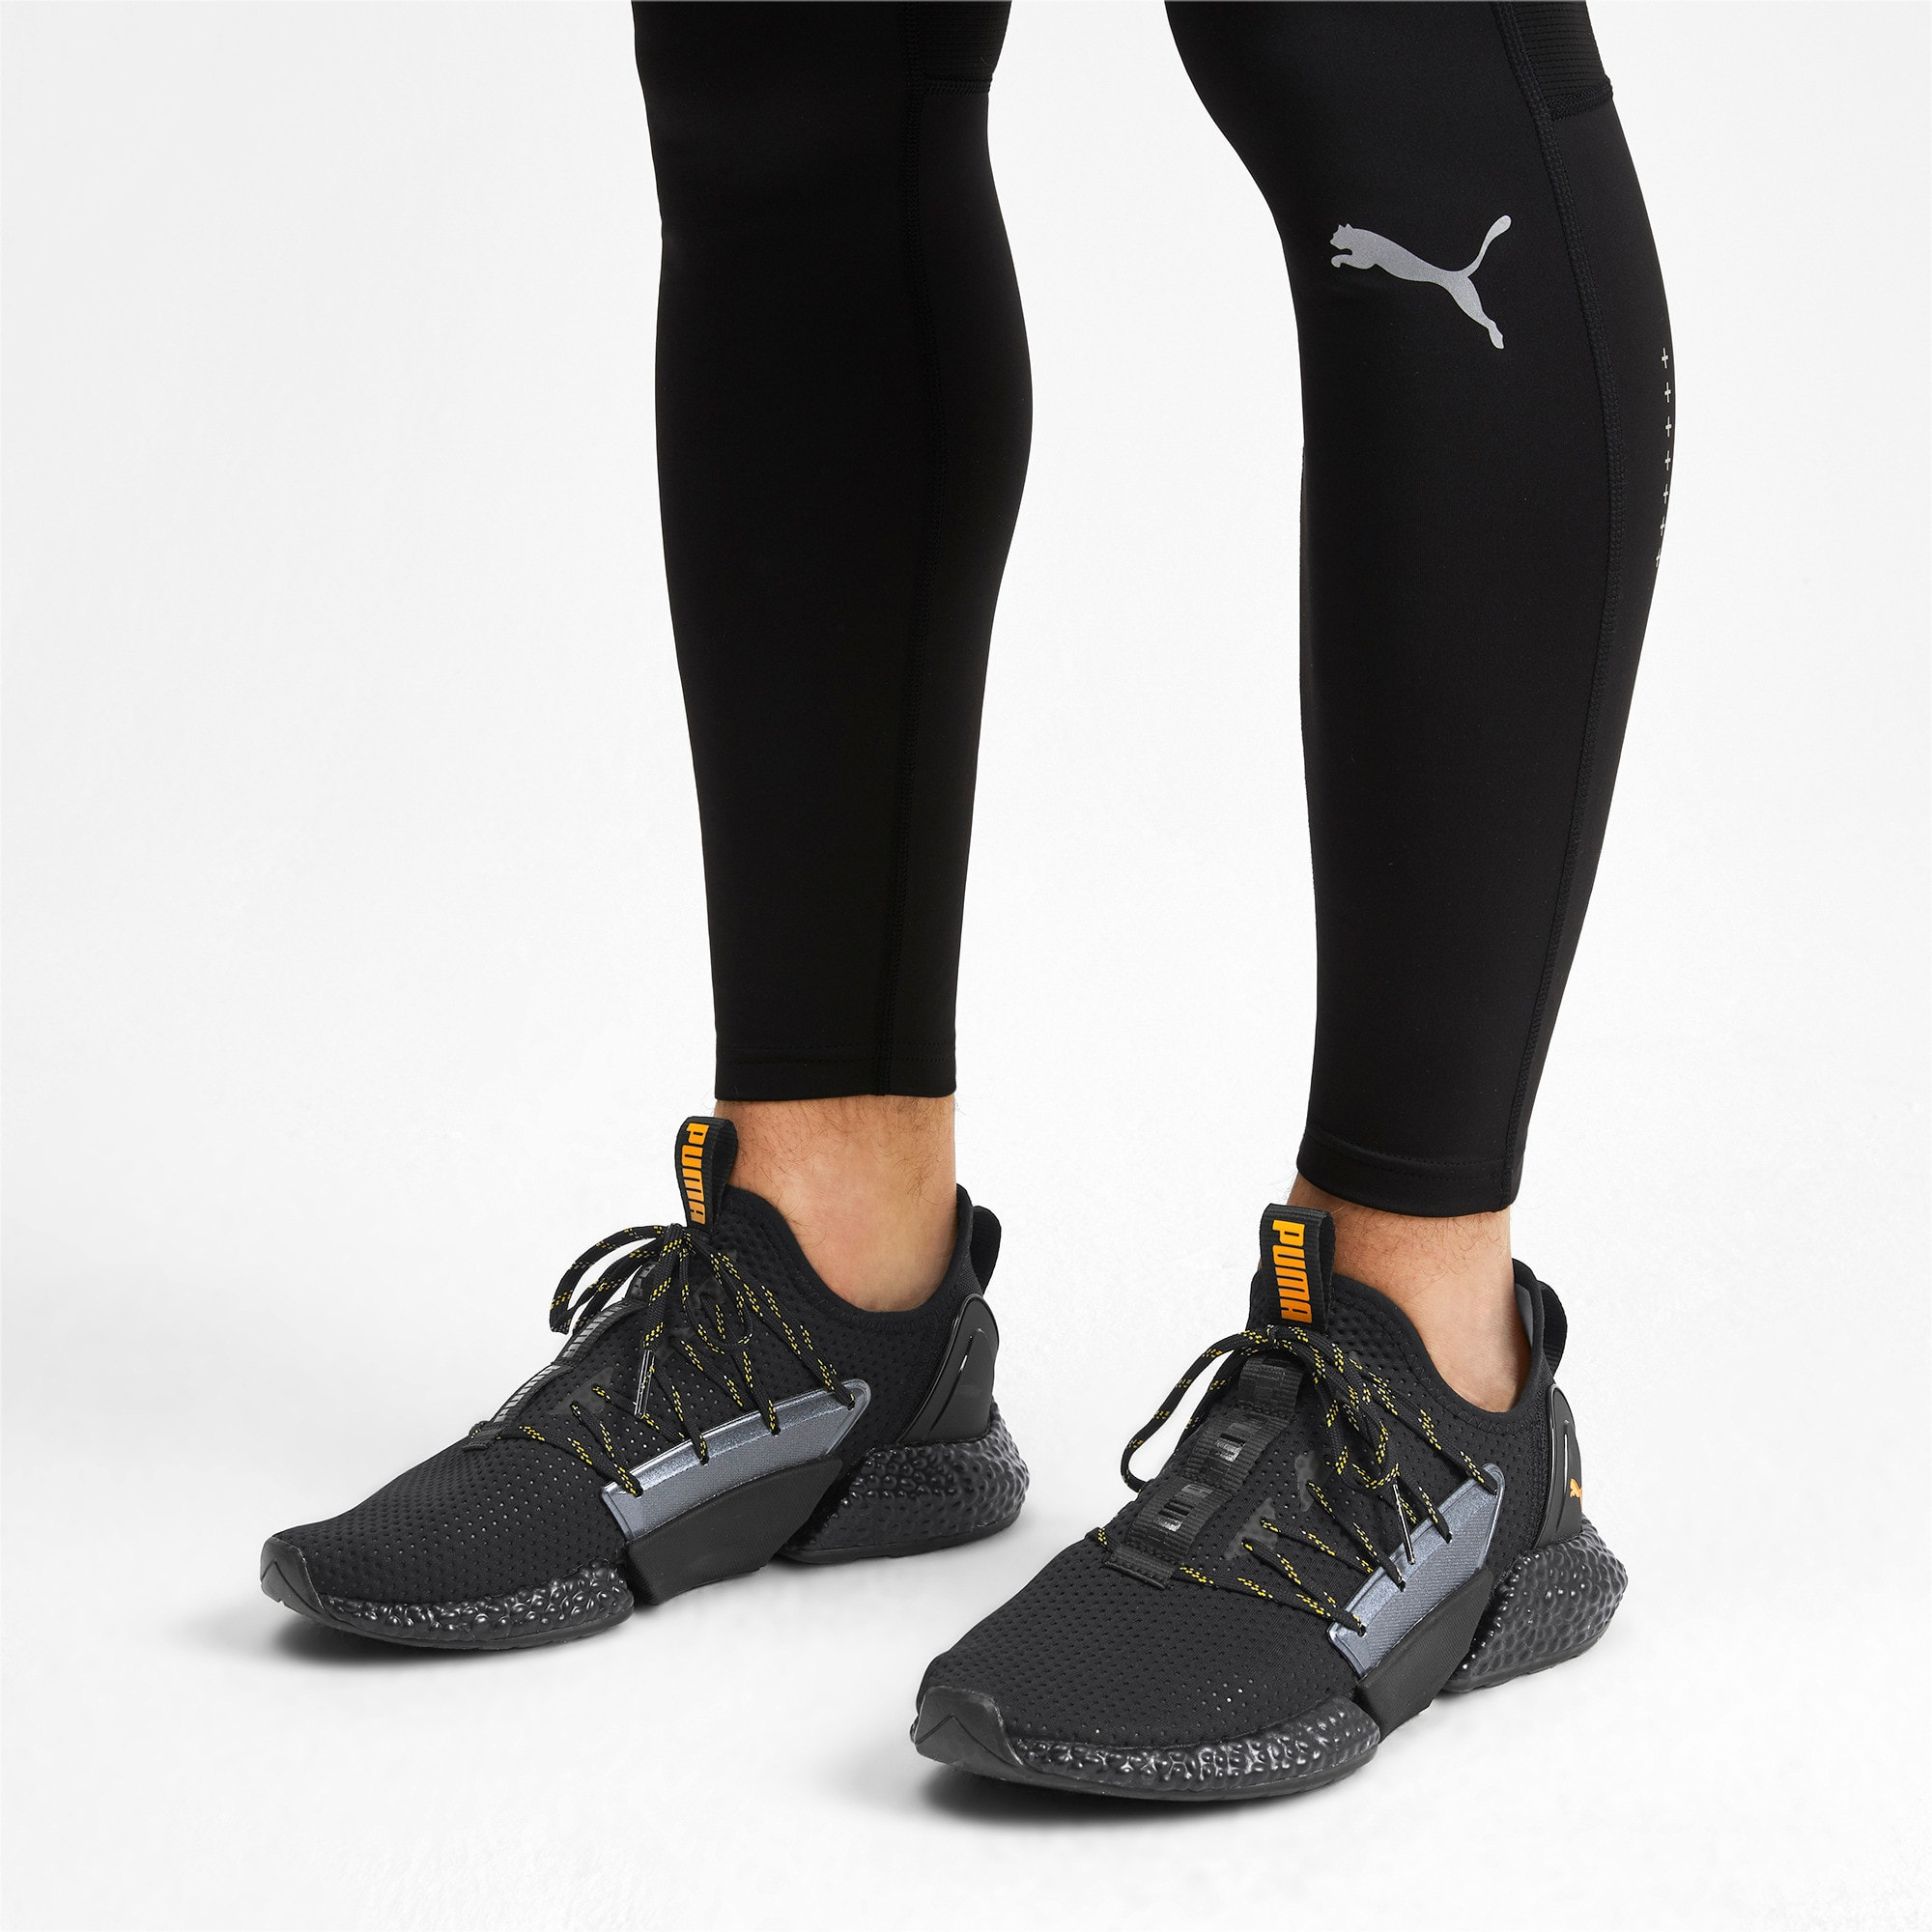 Thumbnail 2 of HYBRID Rocket Aero Men's Sneakers, Puma Black-Puma Black, medium